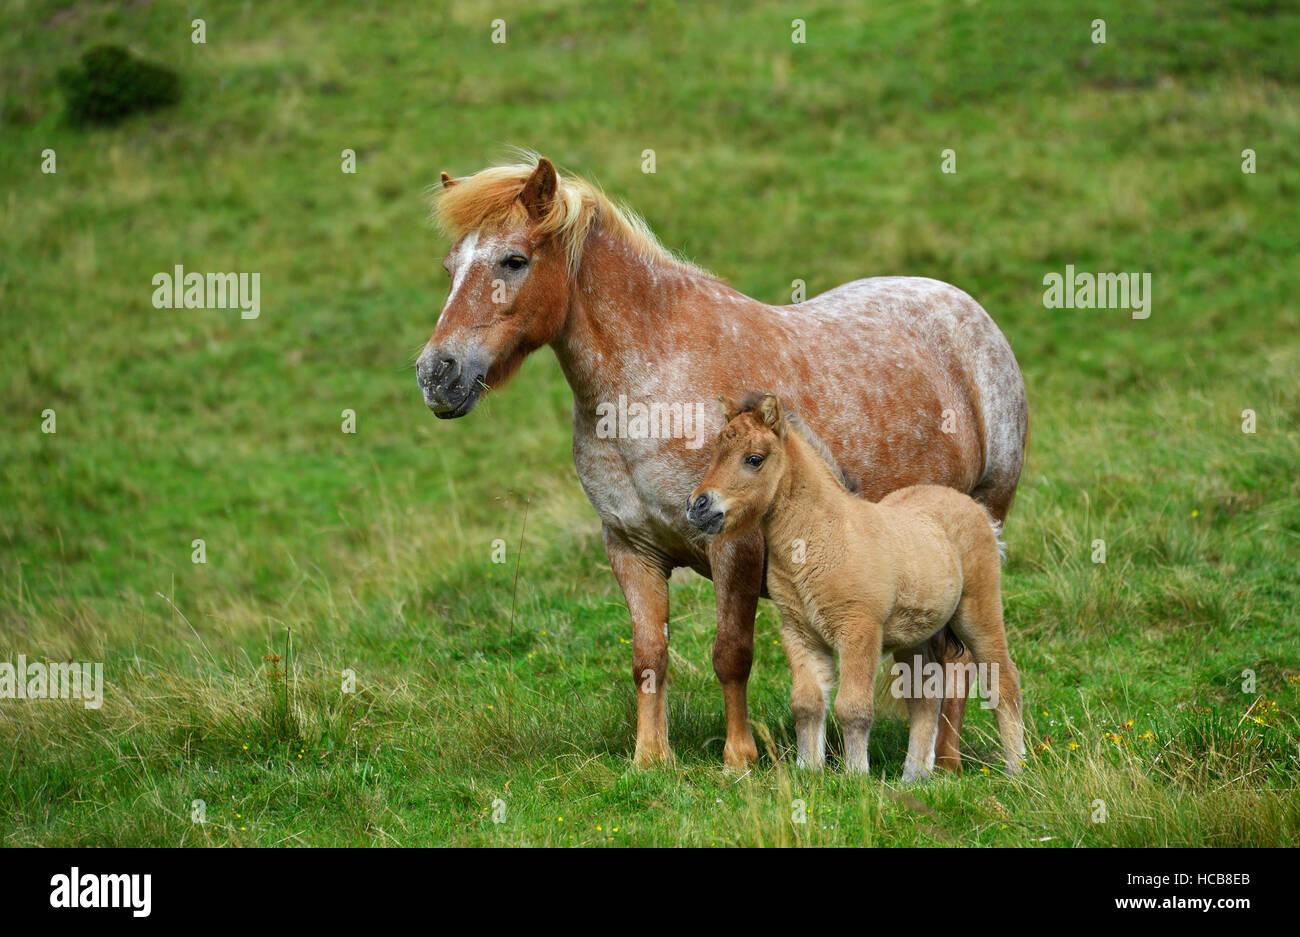 Shetland pony (Equus ferus caballus) with foal on alpine pasture, Carinthia, Austria Stock Photo